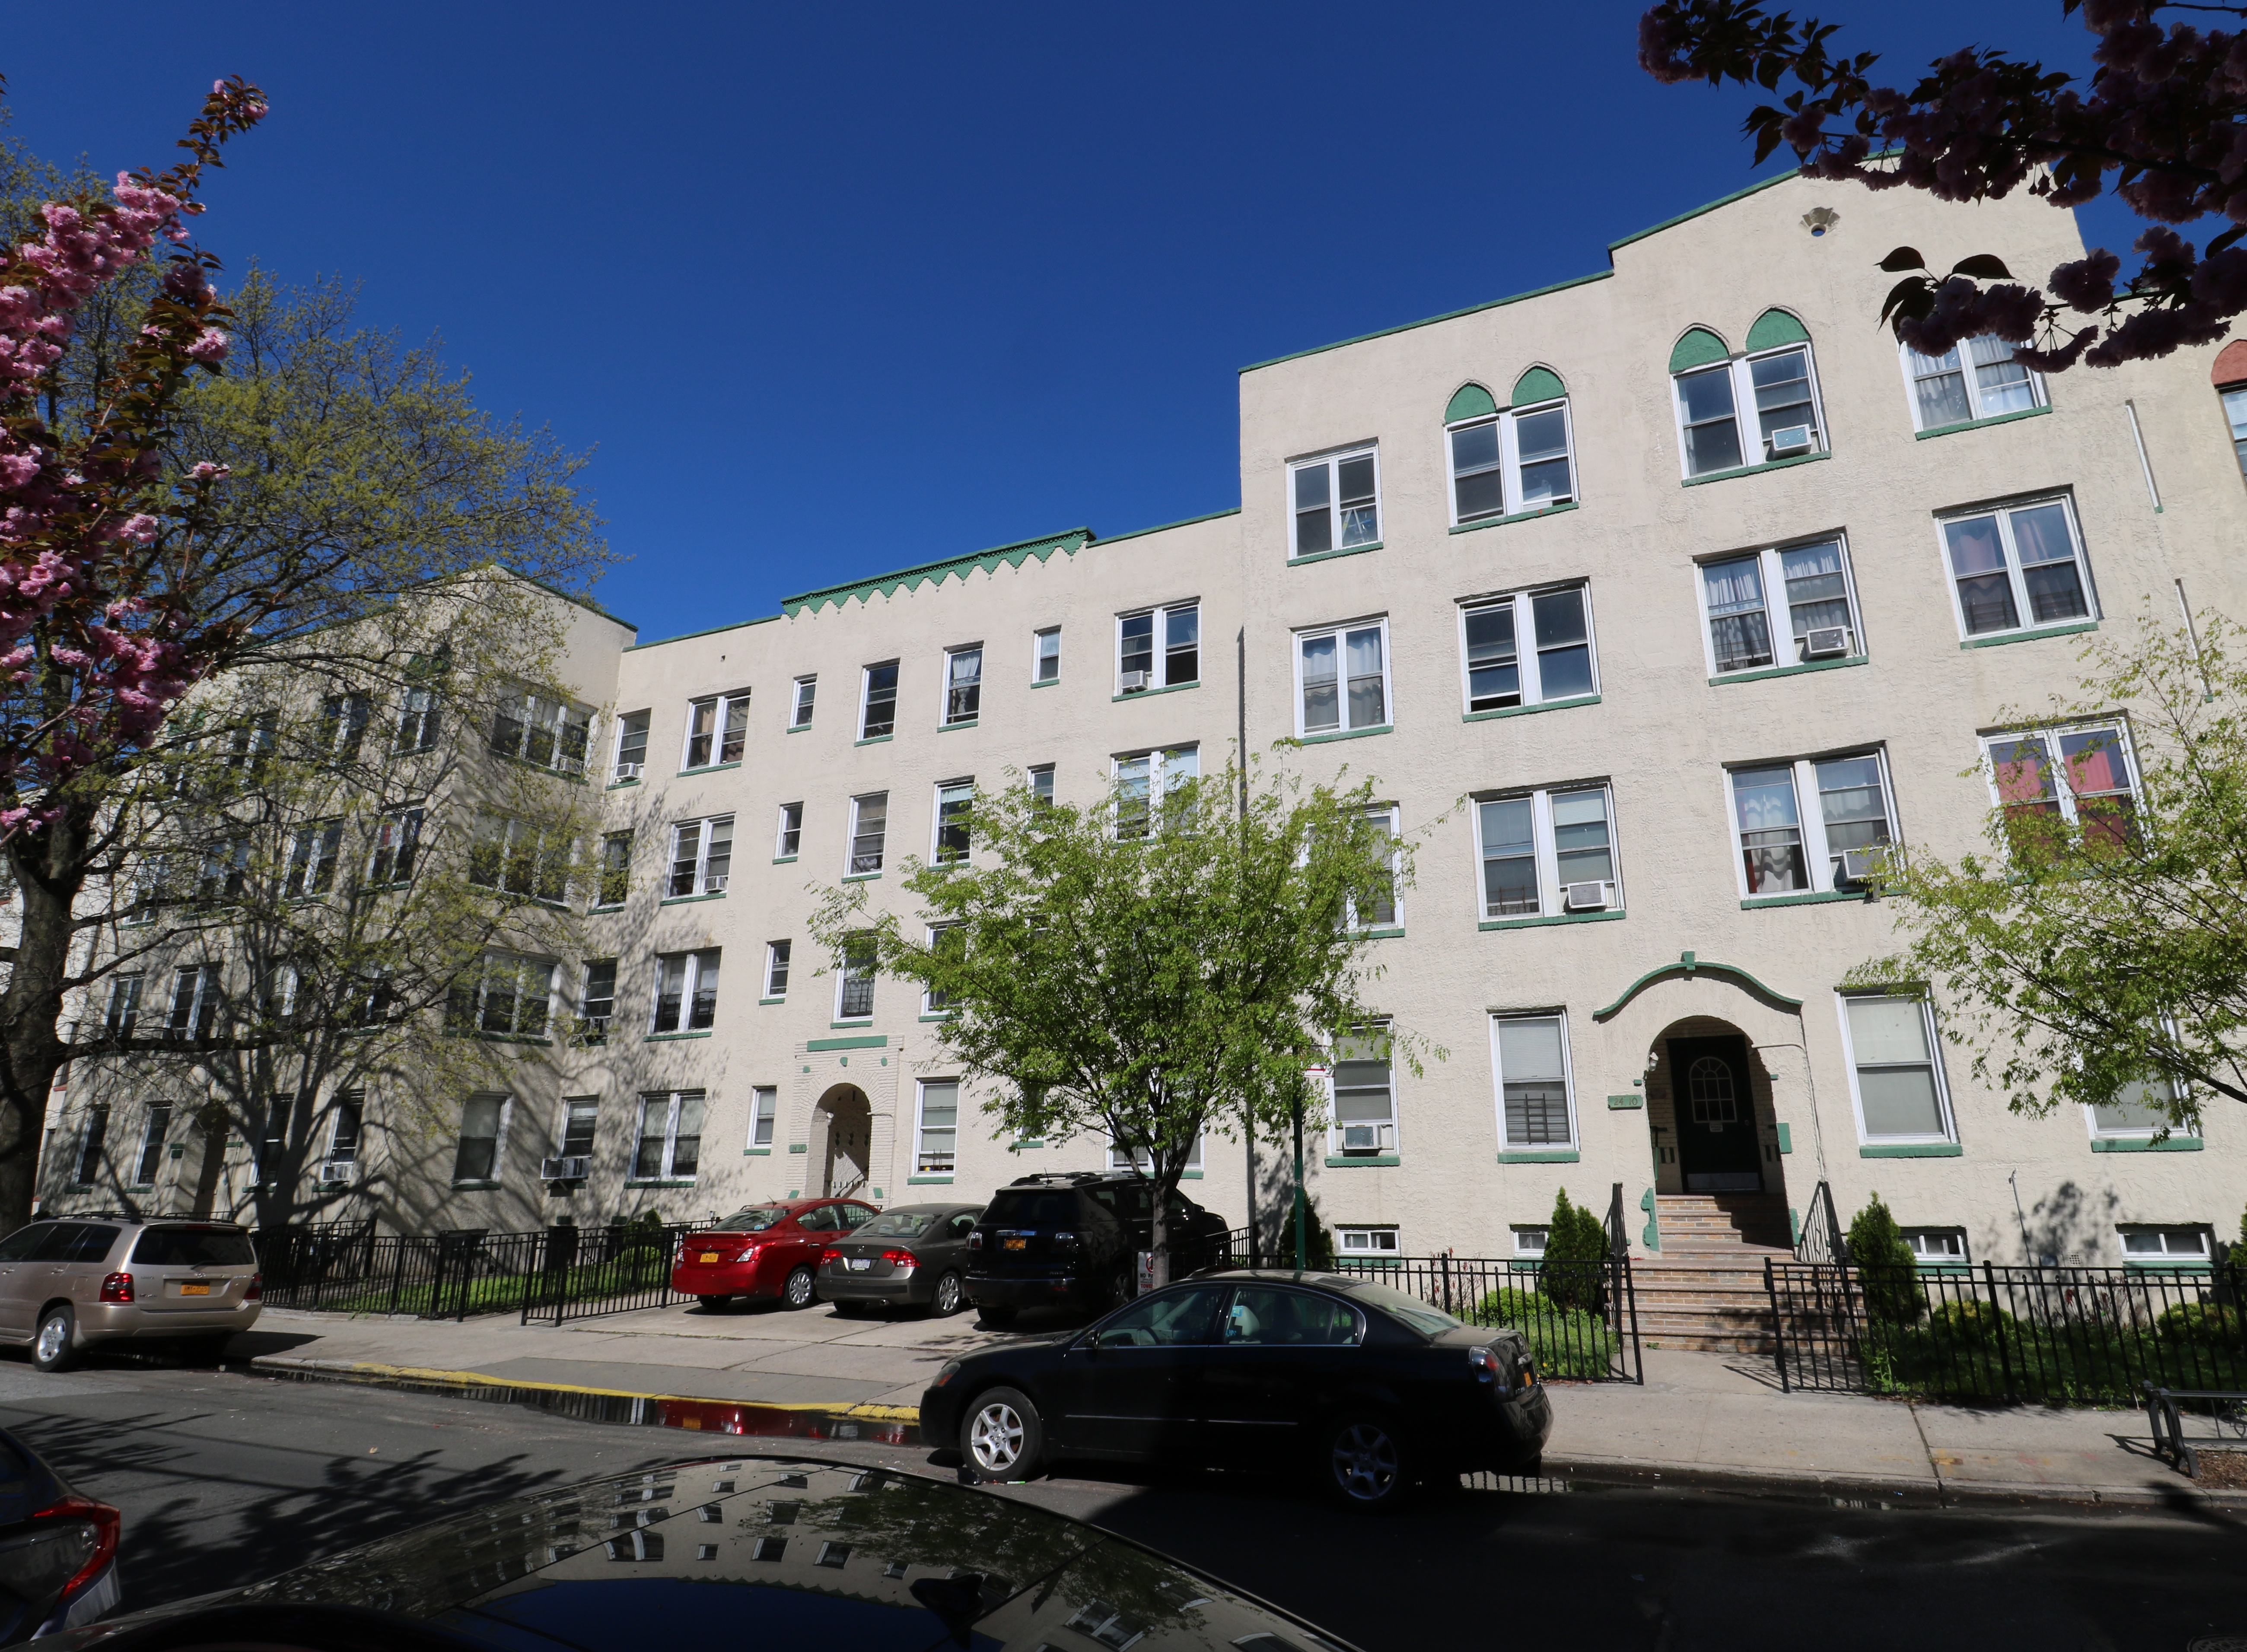 Corbin And Kline Of Besen Associates Sell Astoria Apartment